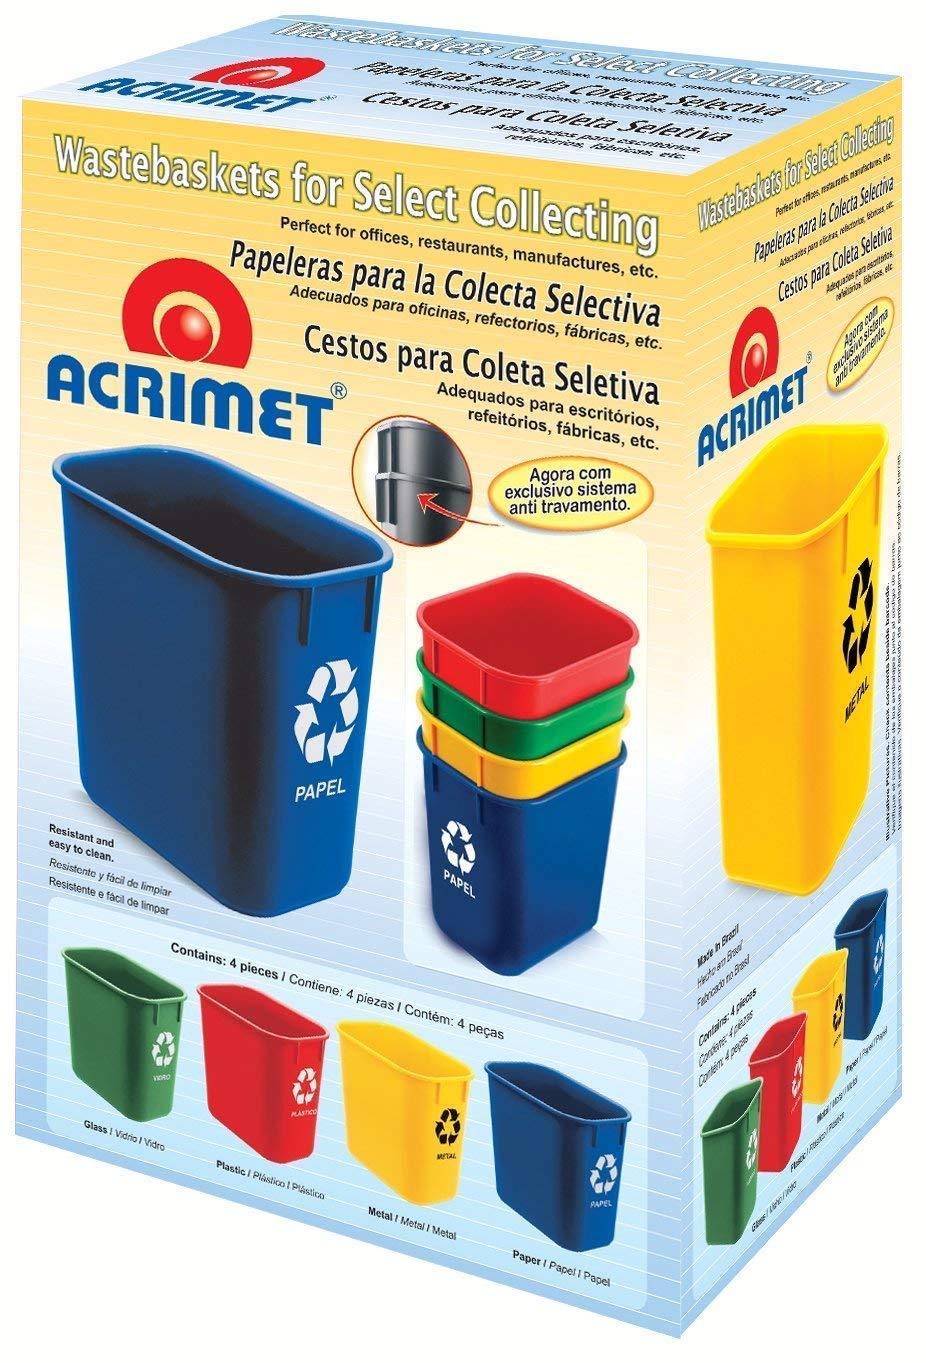 Acrimet Wastebasket for Recycling 13QT (4 Units) by Acrimet